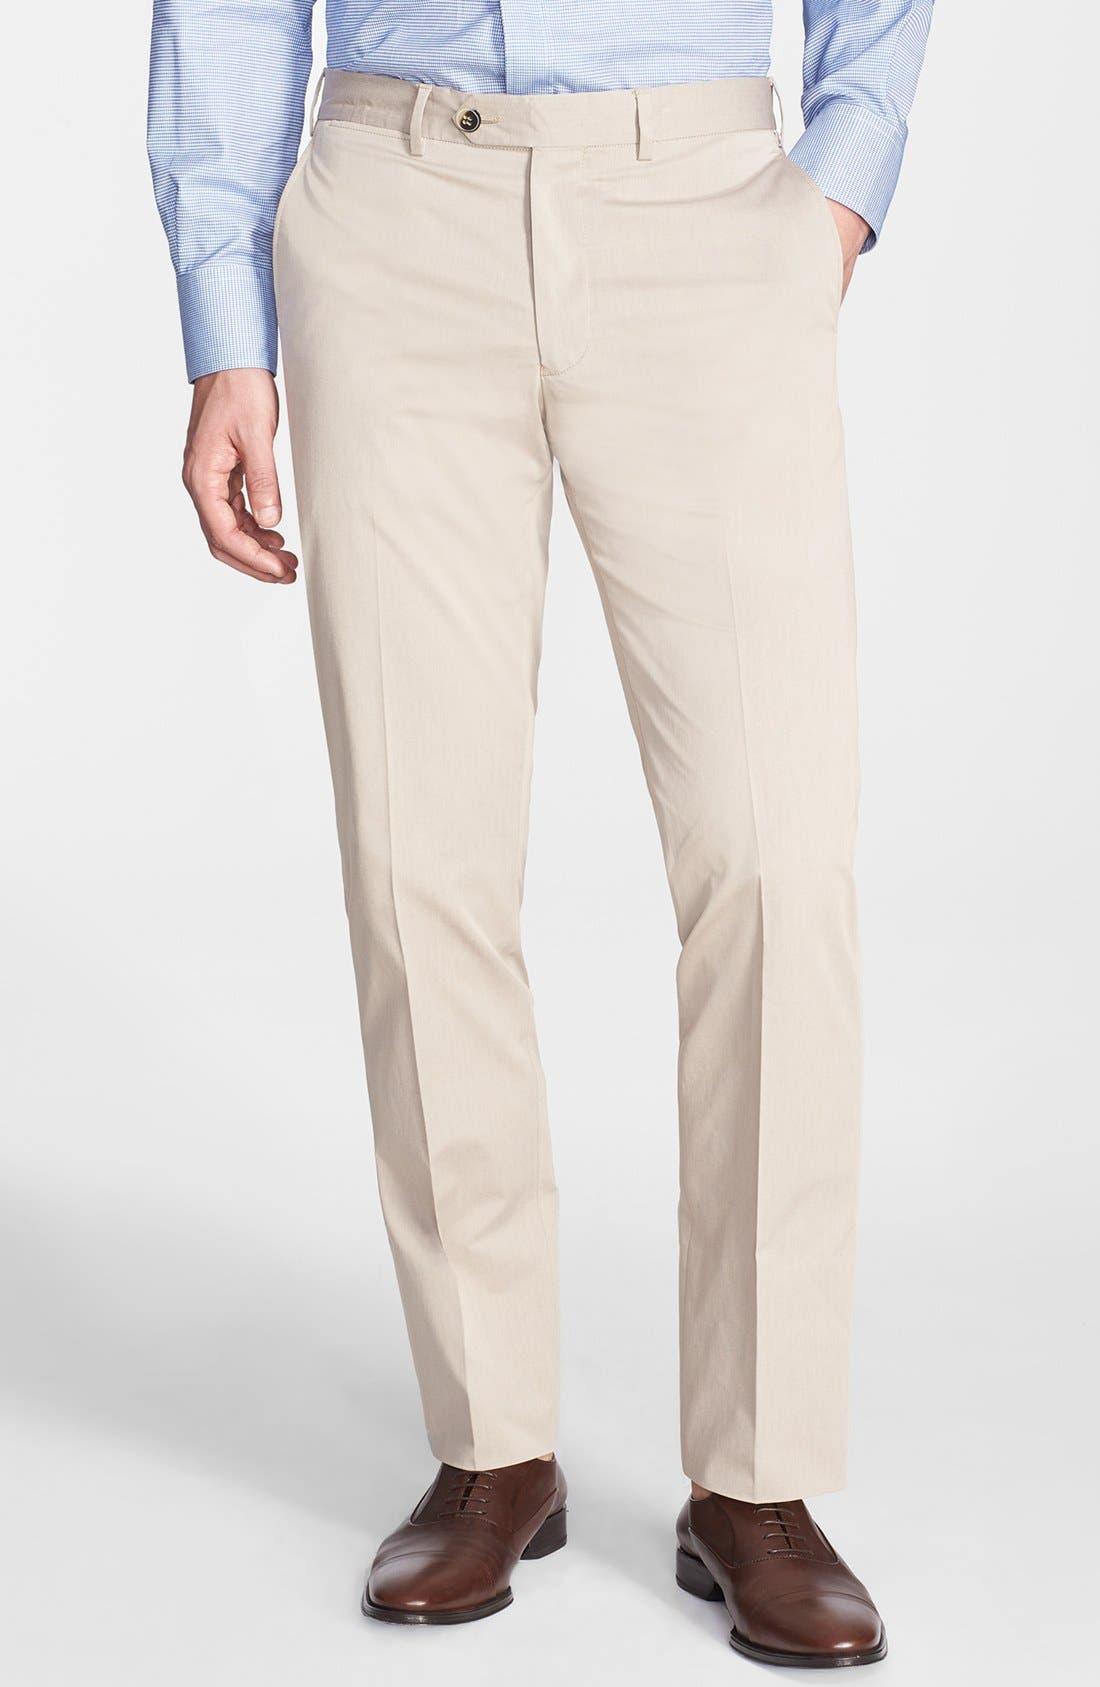 Main Image - Canali Five Pocket Stretch Cotton Italian Pants